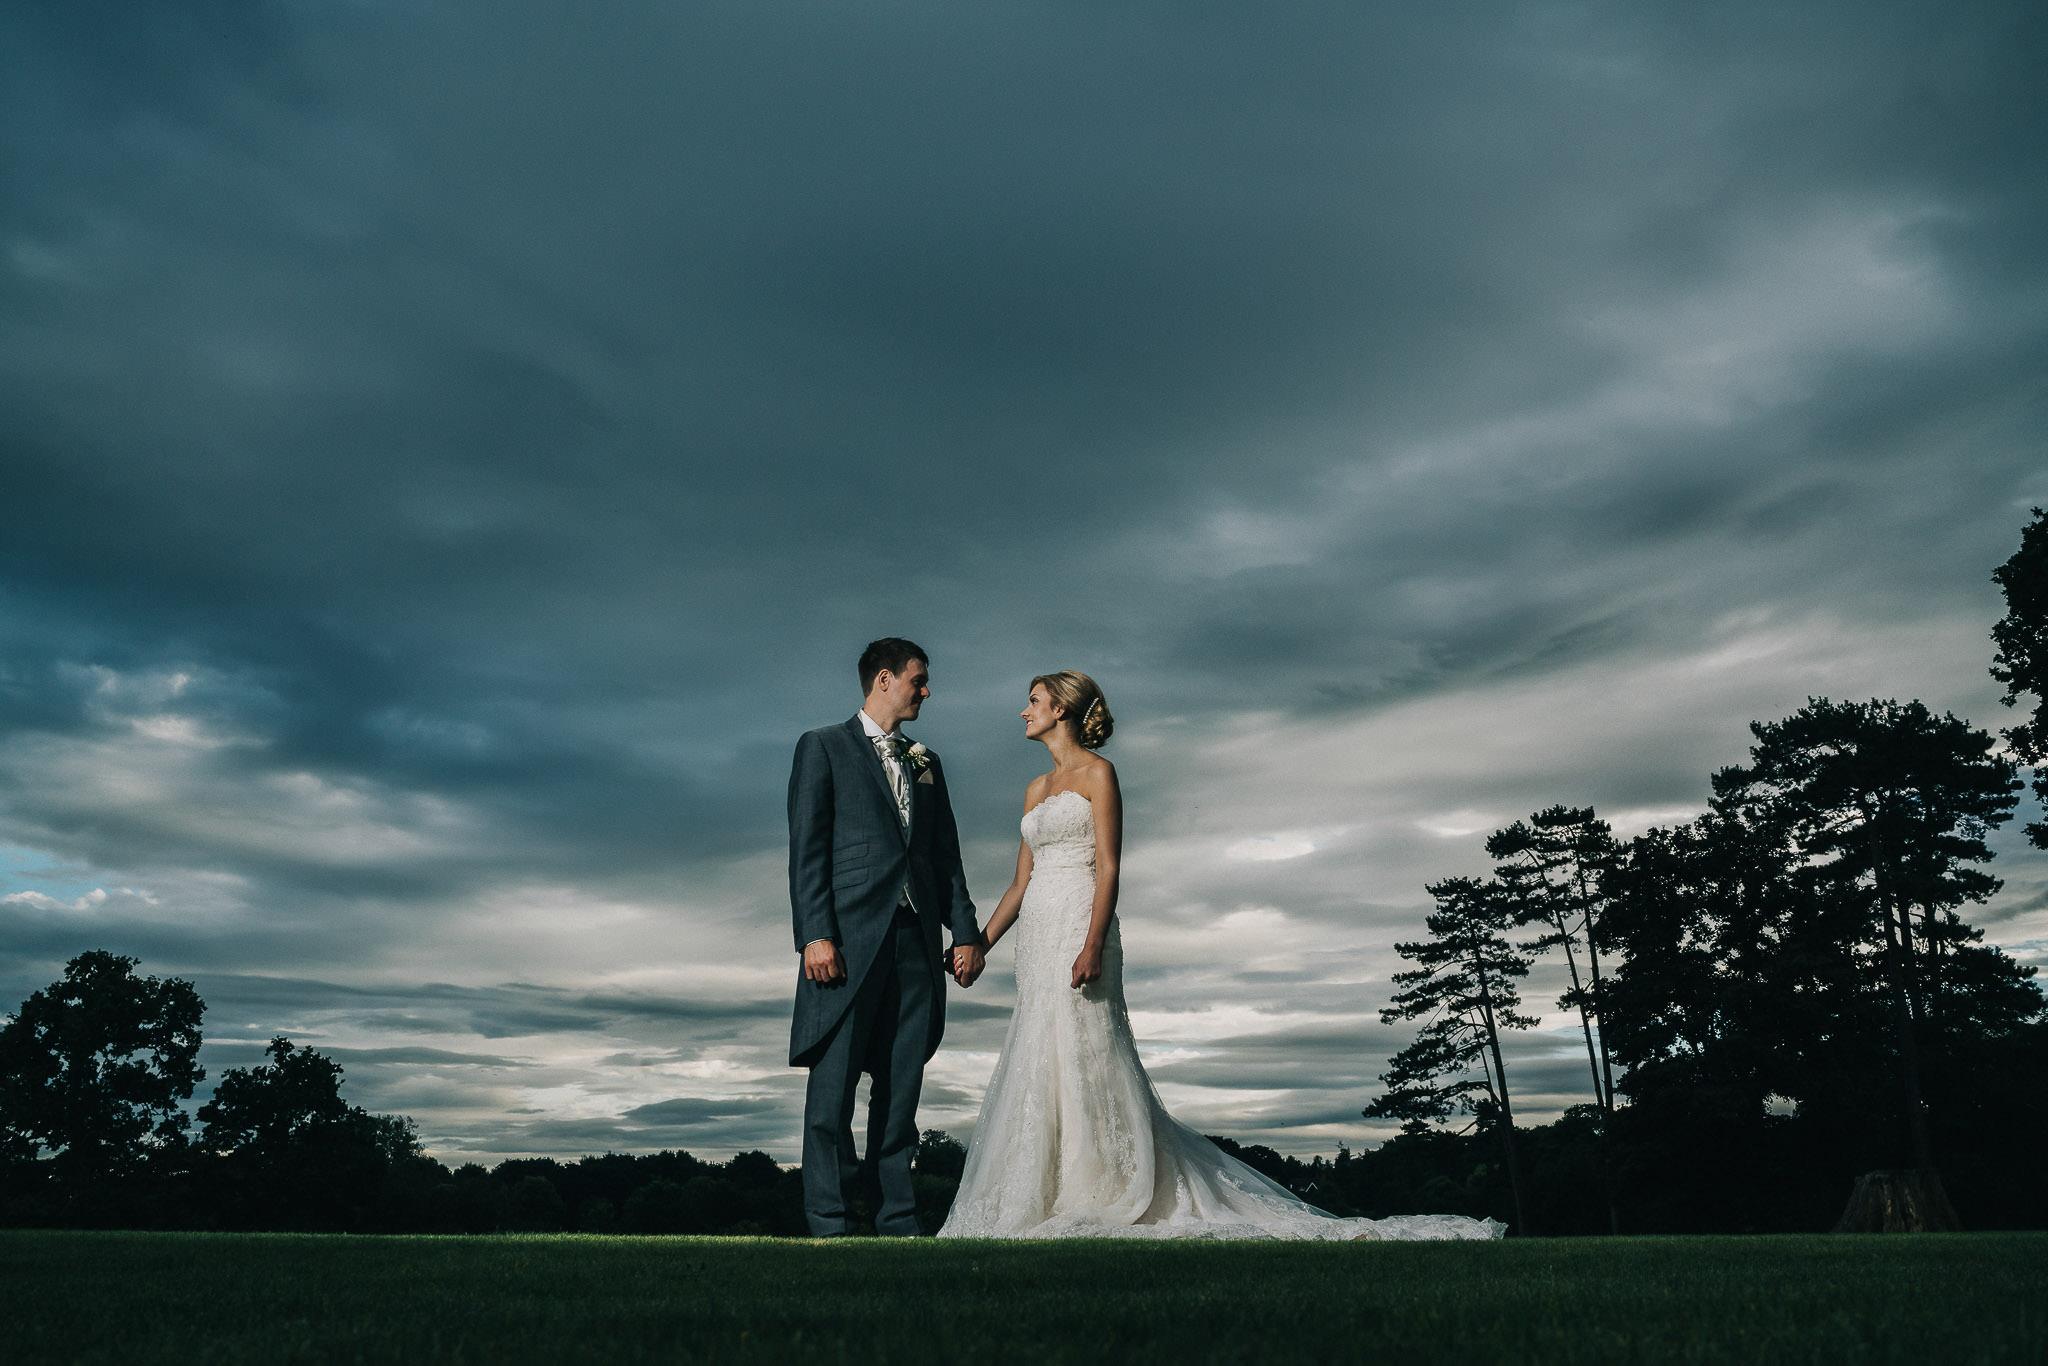 Staffordshire-Wedding-Photographer-243.jpg